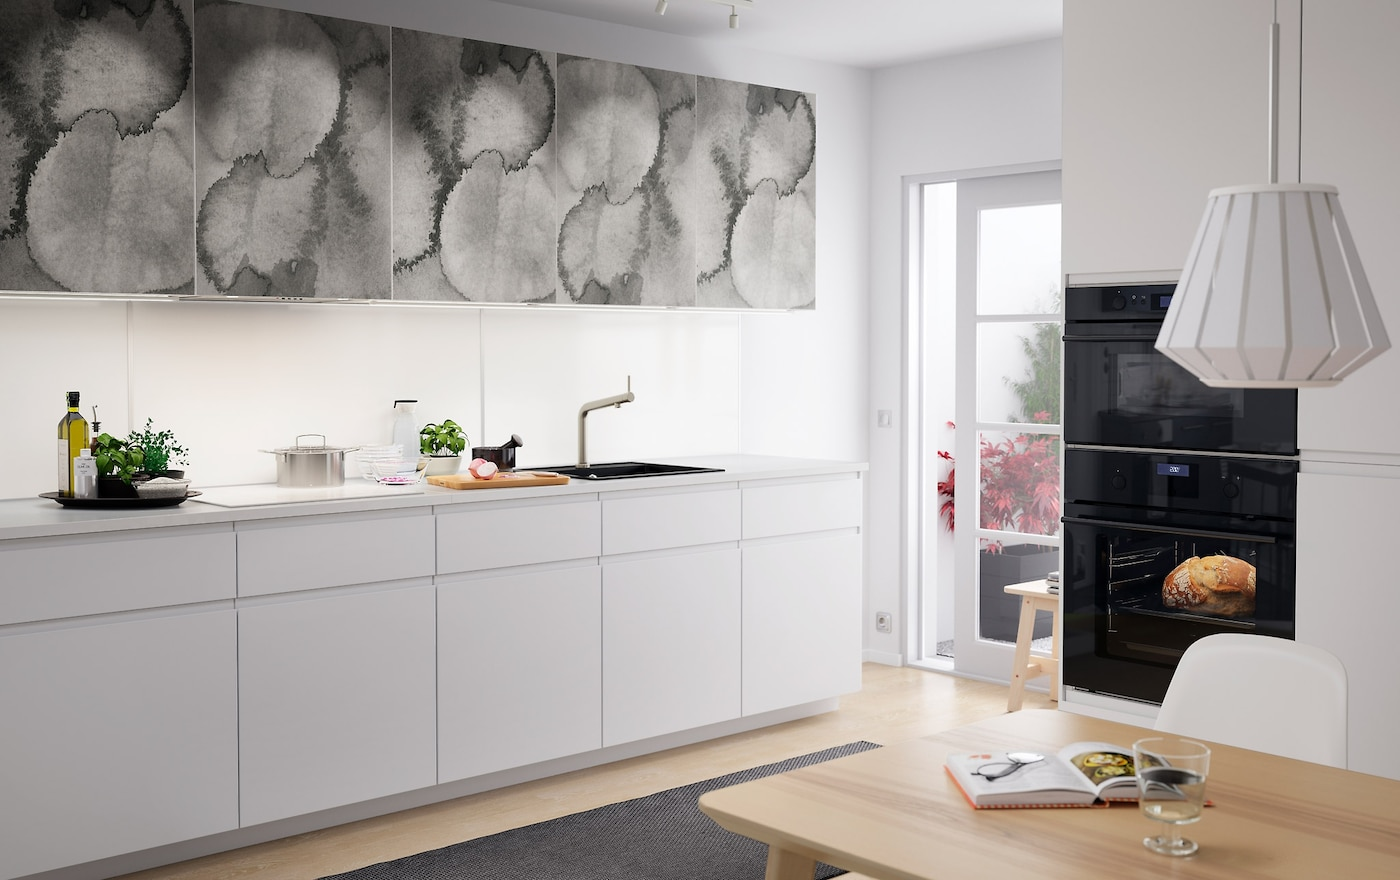 Cucina con motivi grafici d effetto idee cucina ikea